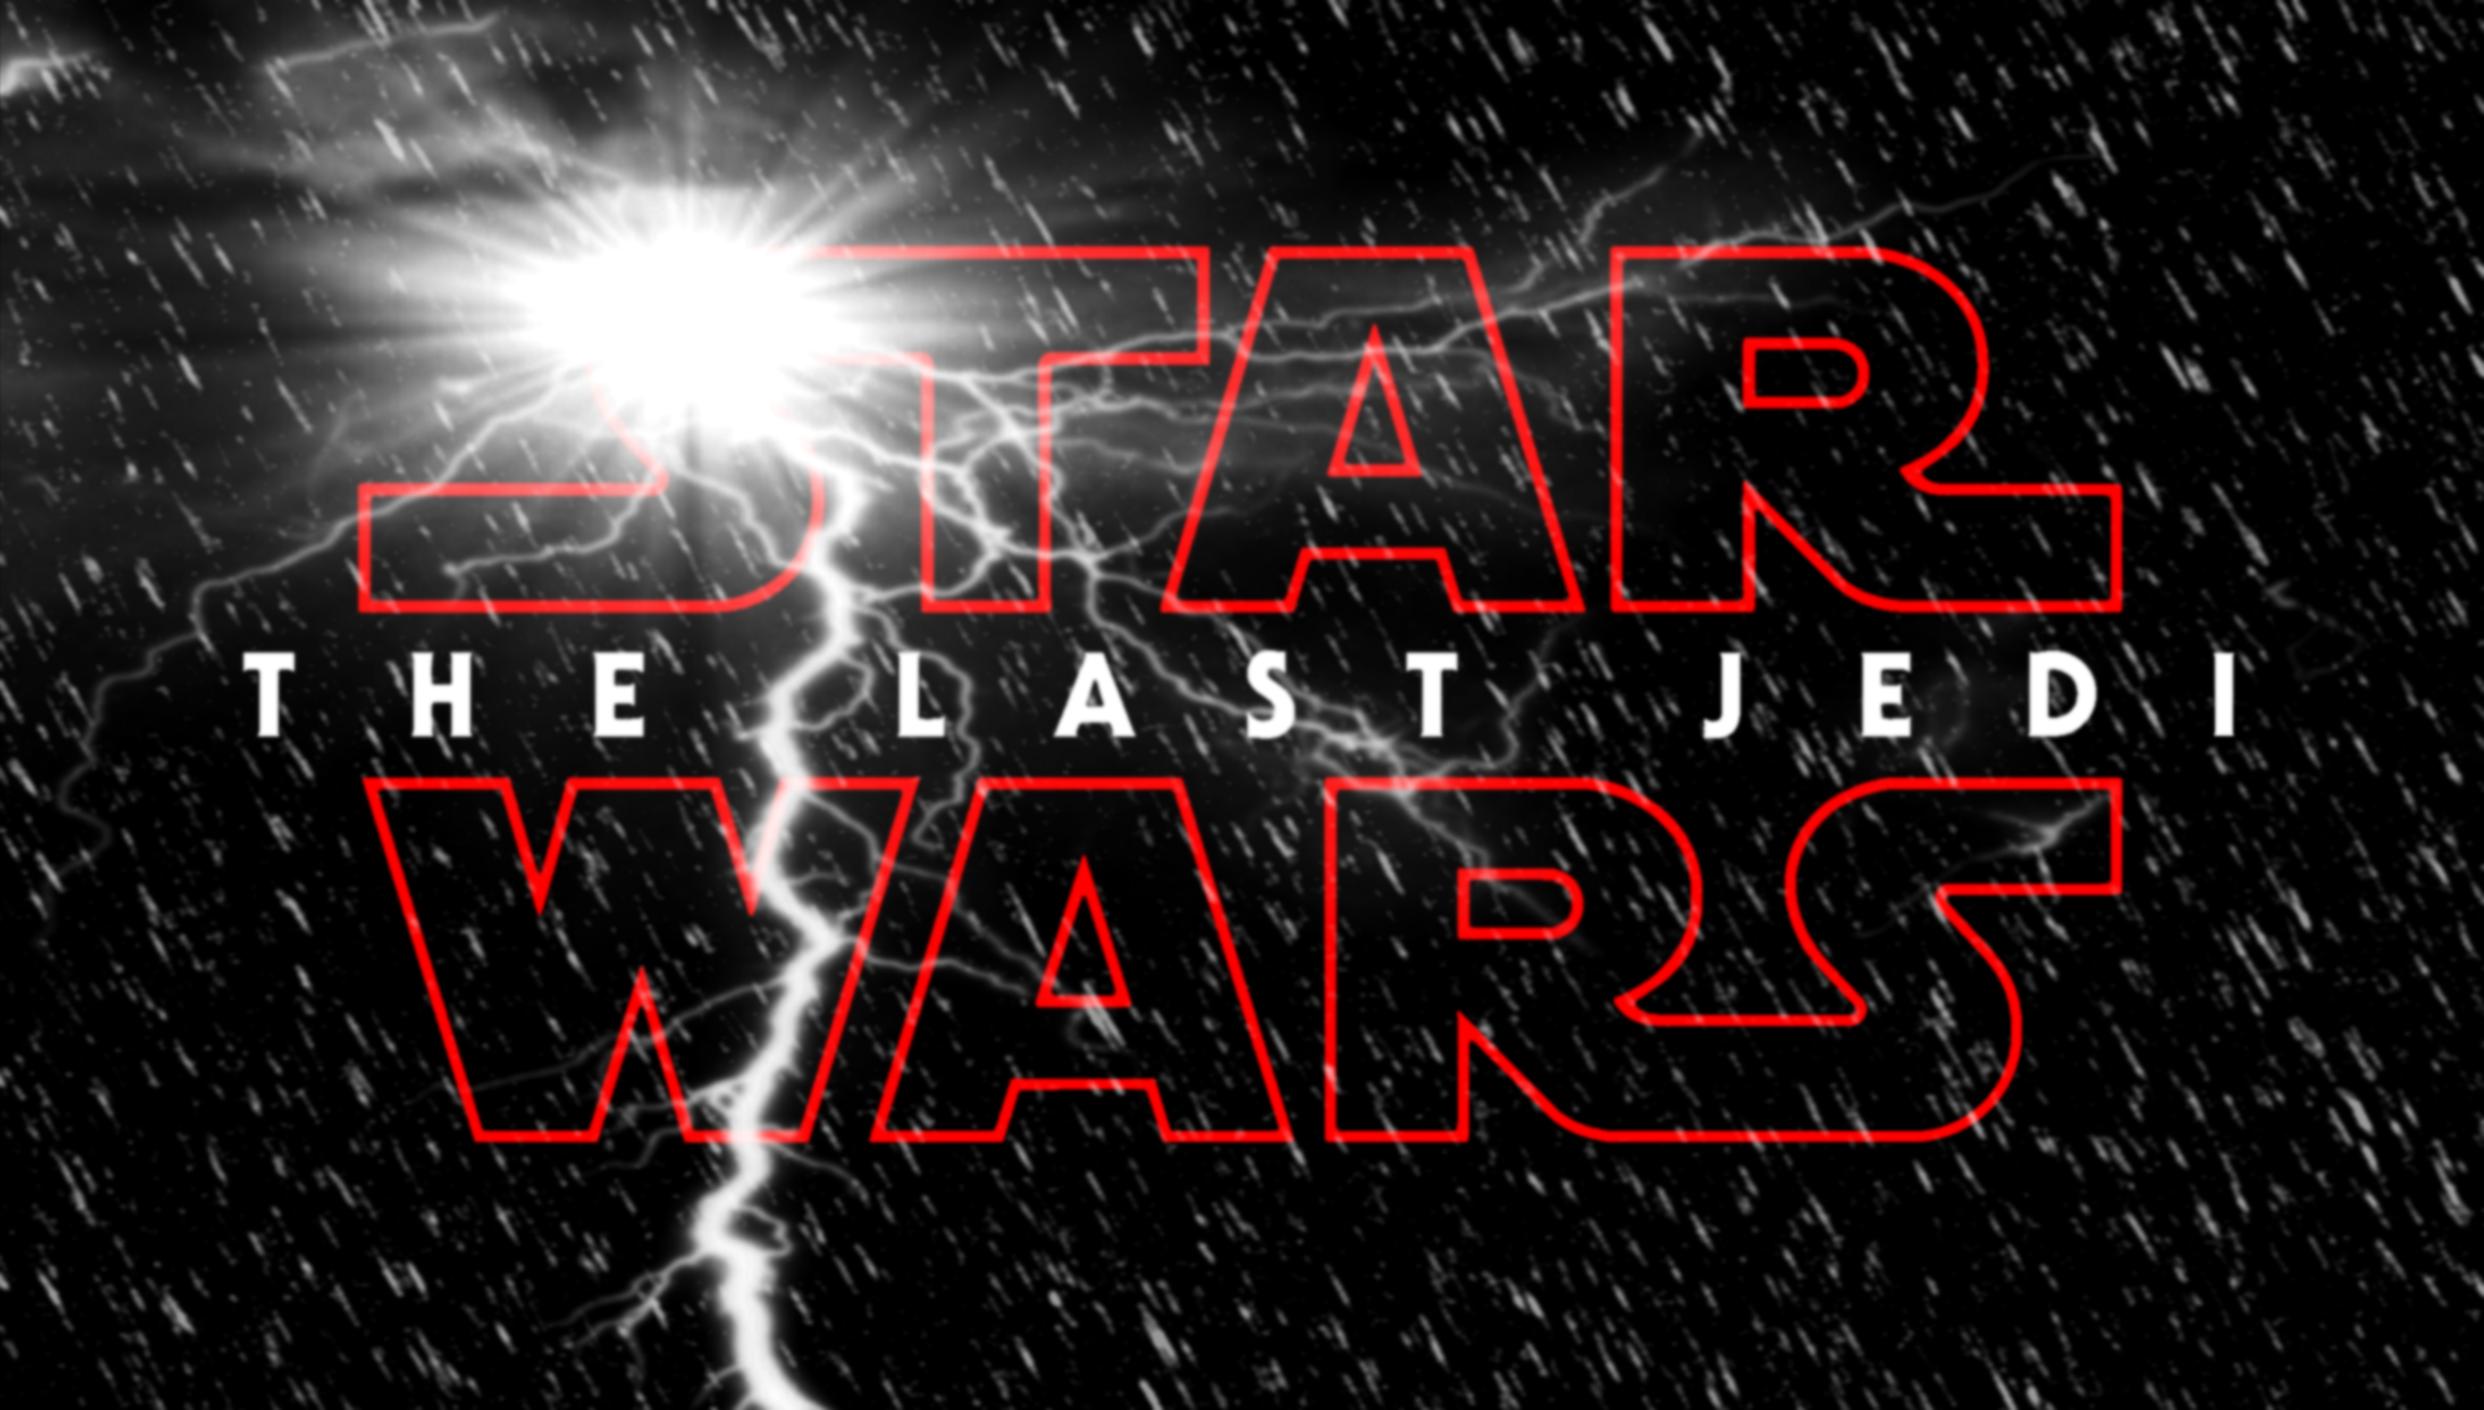 Star Wars Episode 8 Wallpaper Posted By Sarah Mercado